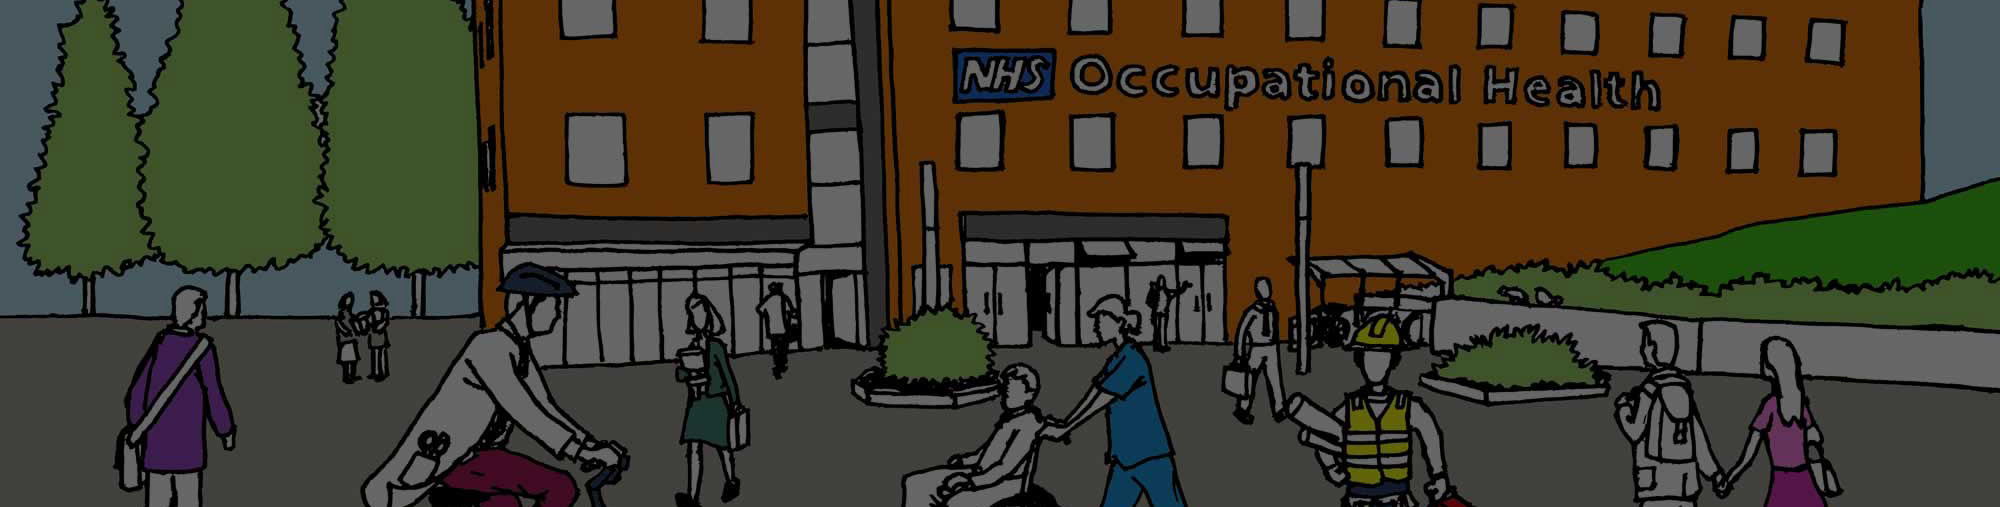 NHS Health at work